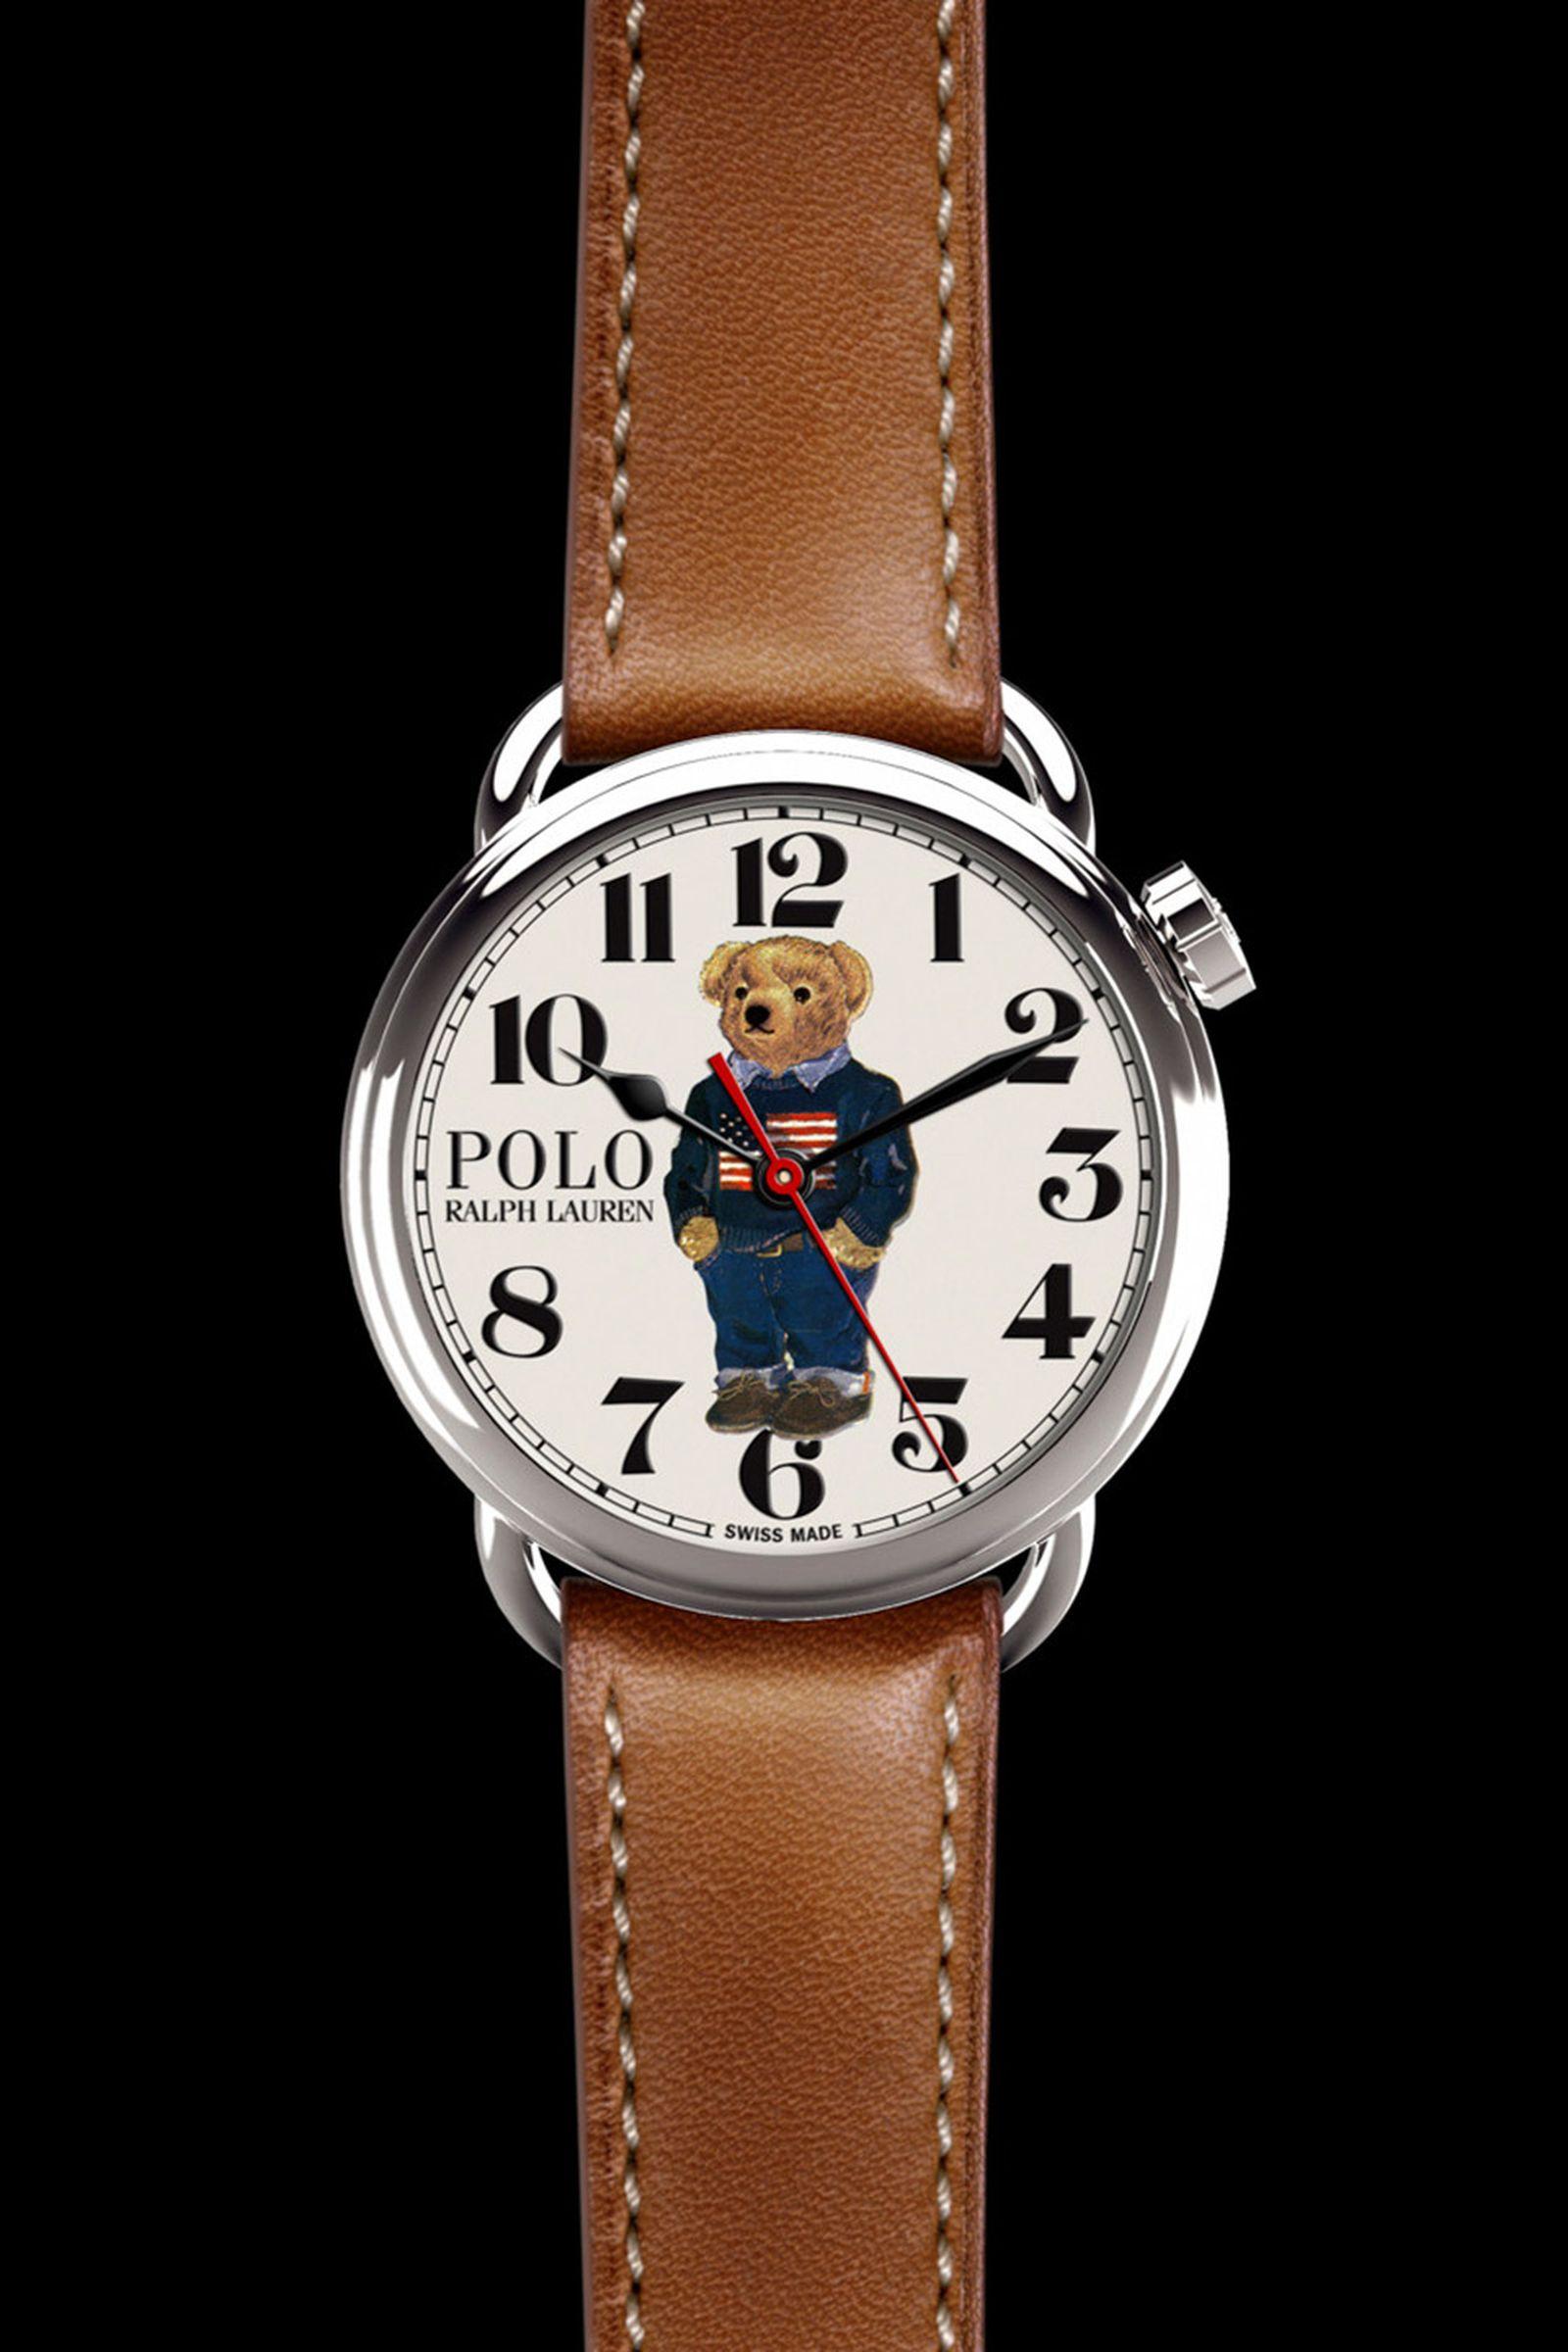 polo ralph lauren watch collection